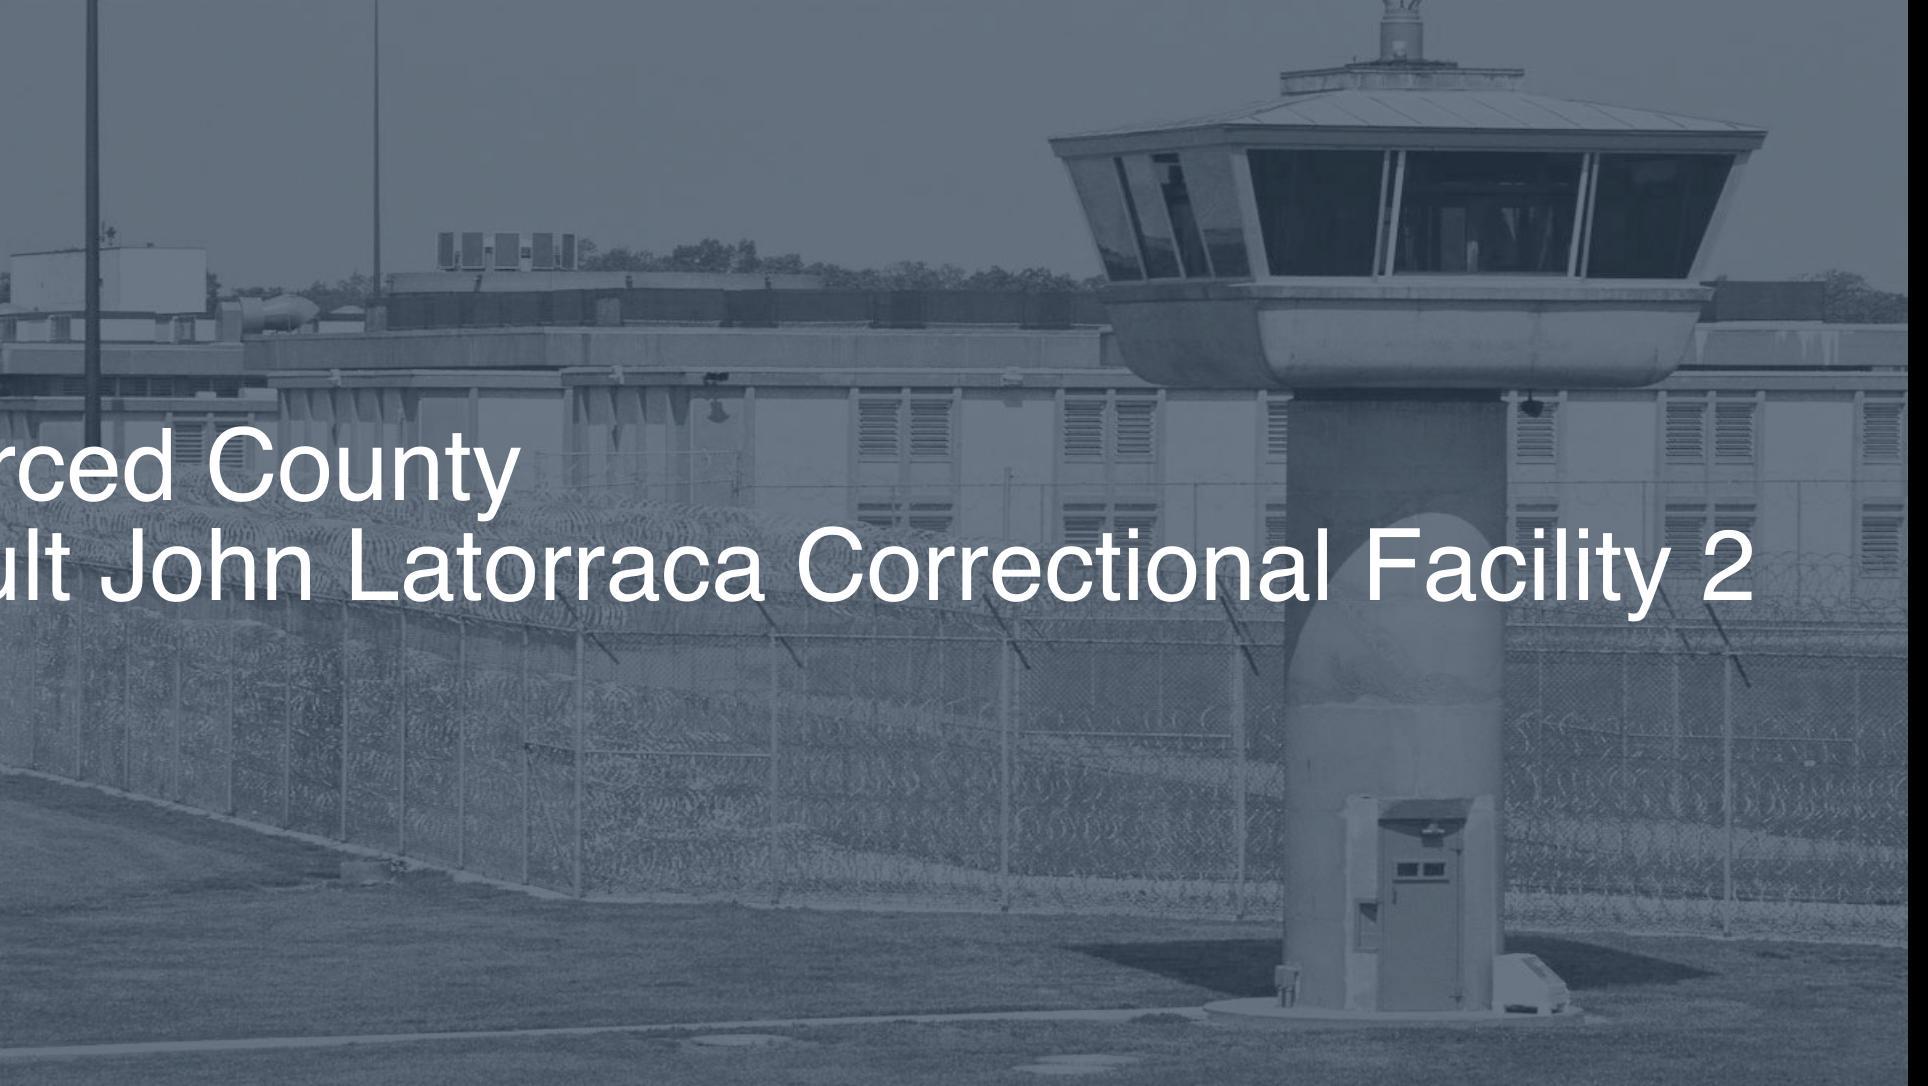 Merced County Adult (John Latorraca) Correctional Facility